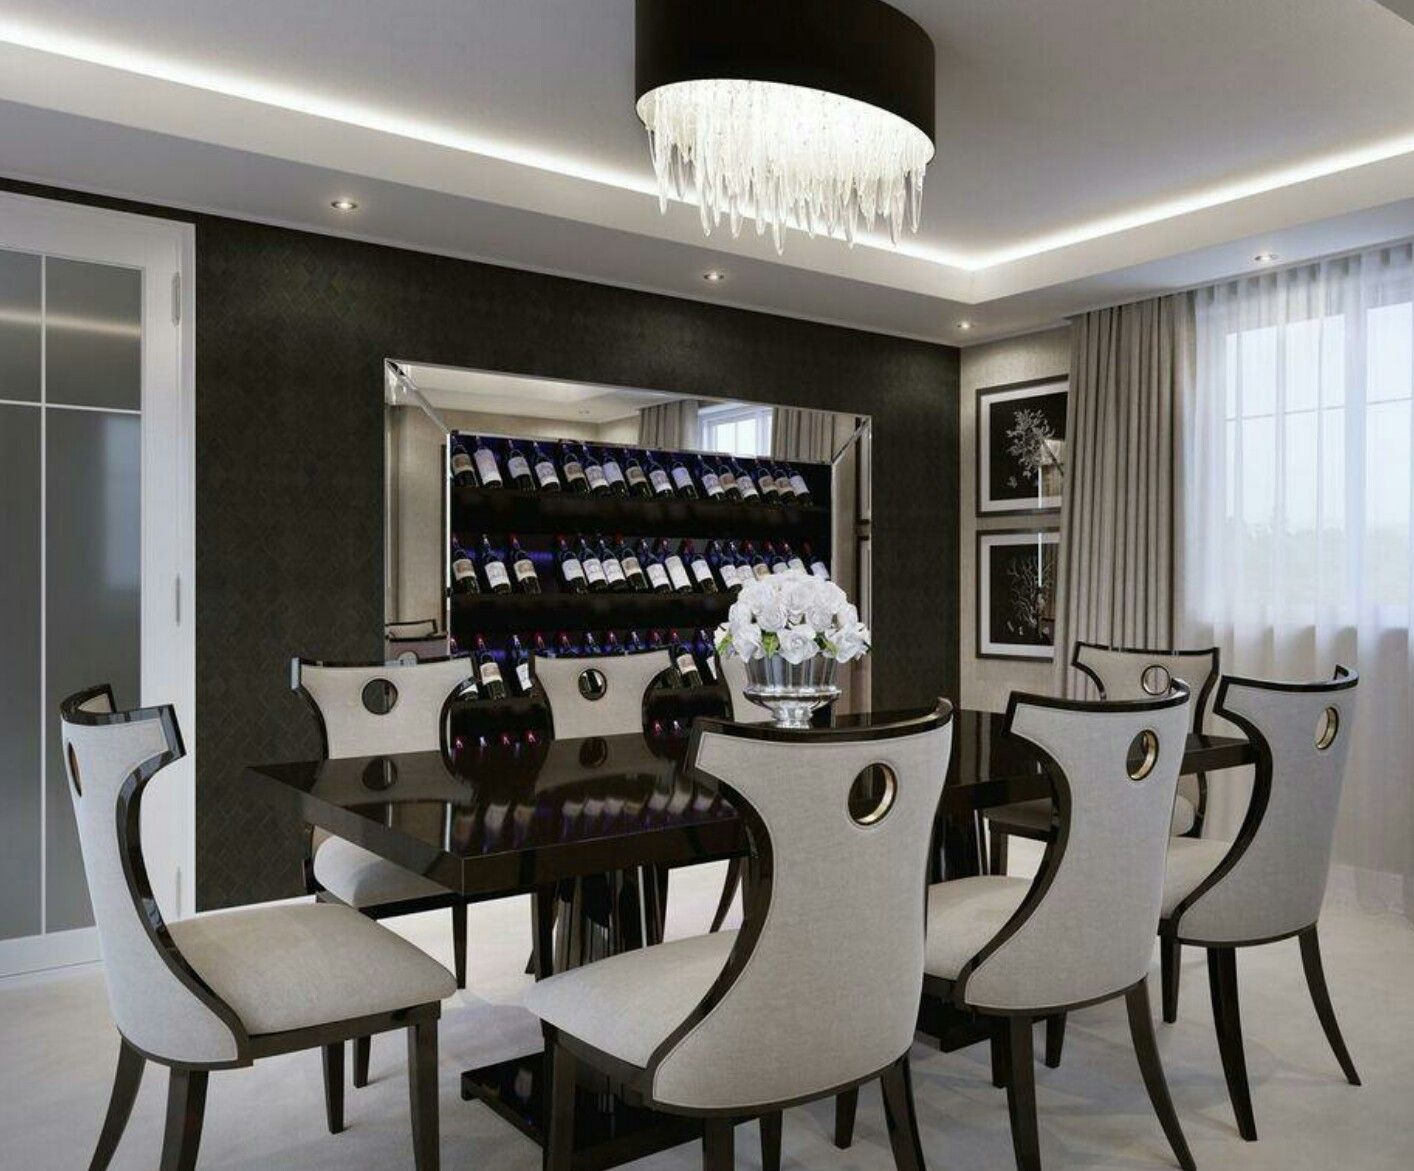 Modern interior designed dining room showhome woven fabric modern interior designed dining room showhome woven fabric wallpapers in two dzzzfo